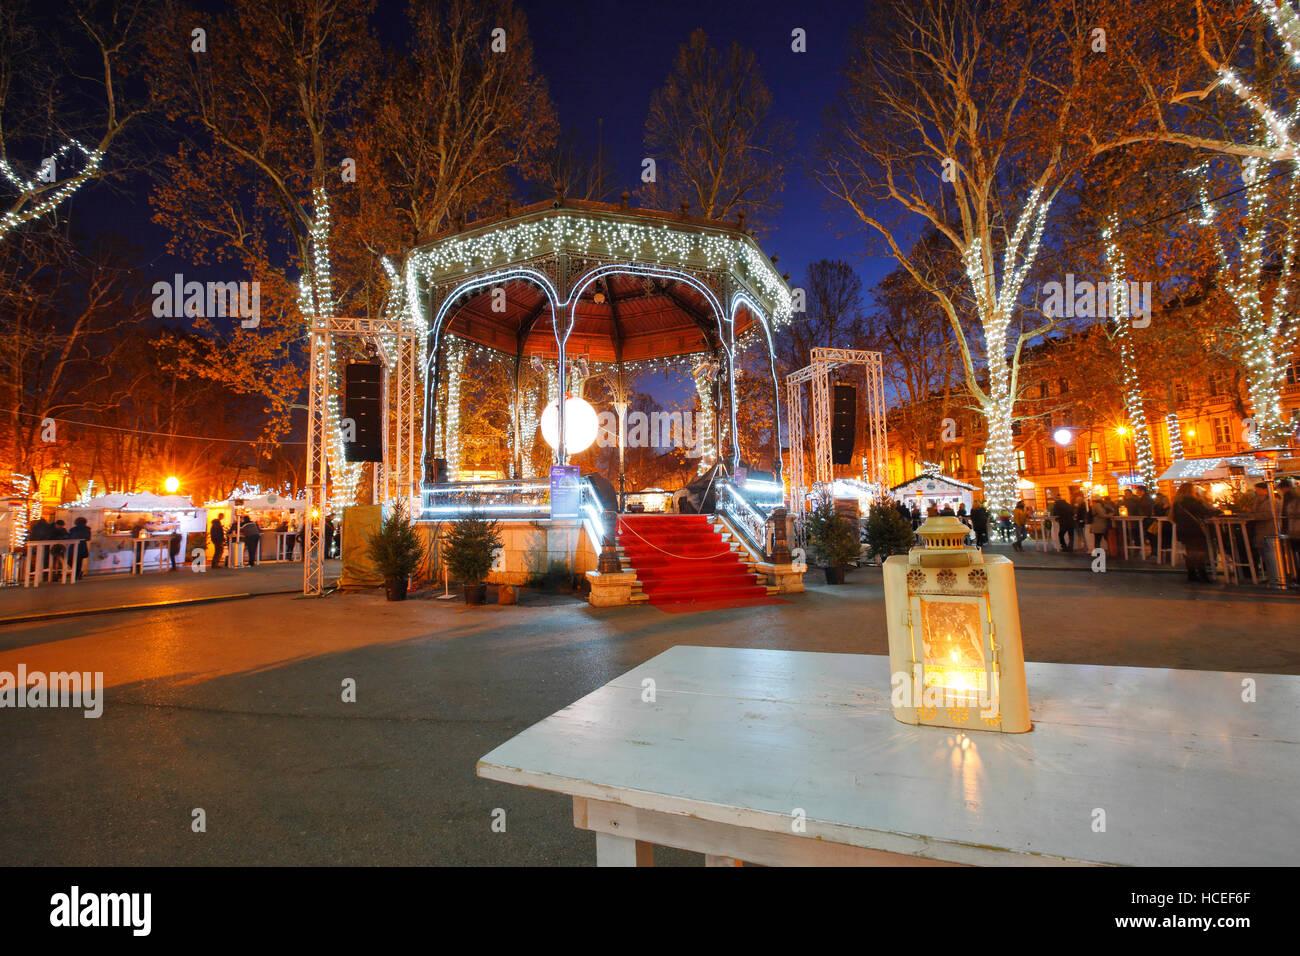 Illuminated Park Zrinjevac At Night In Christmas In Zagreb Stock Photo Alamy